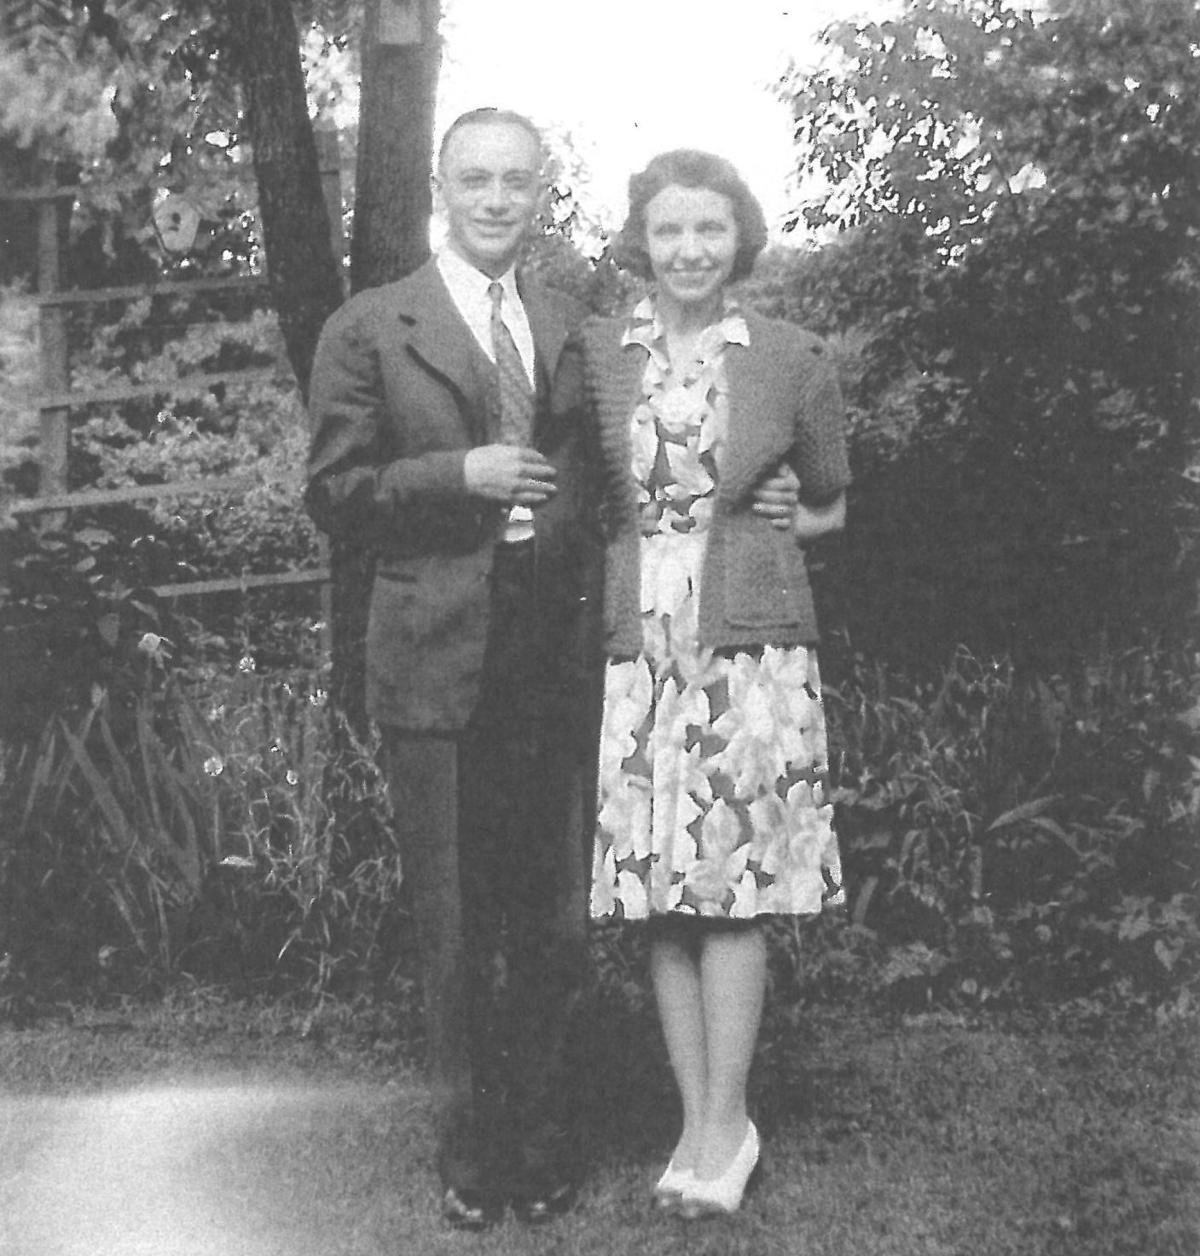 A 1938 country romance